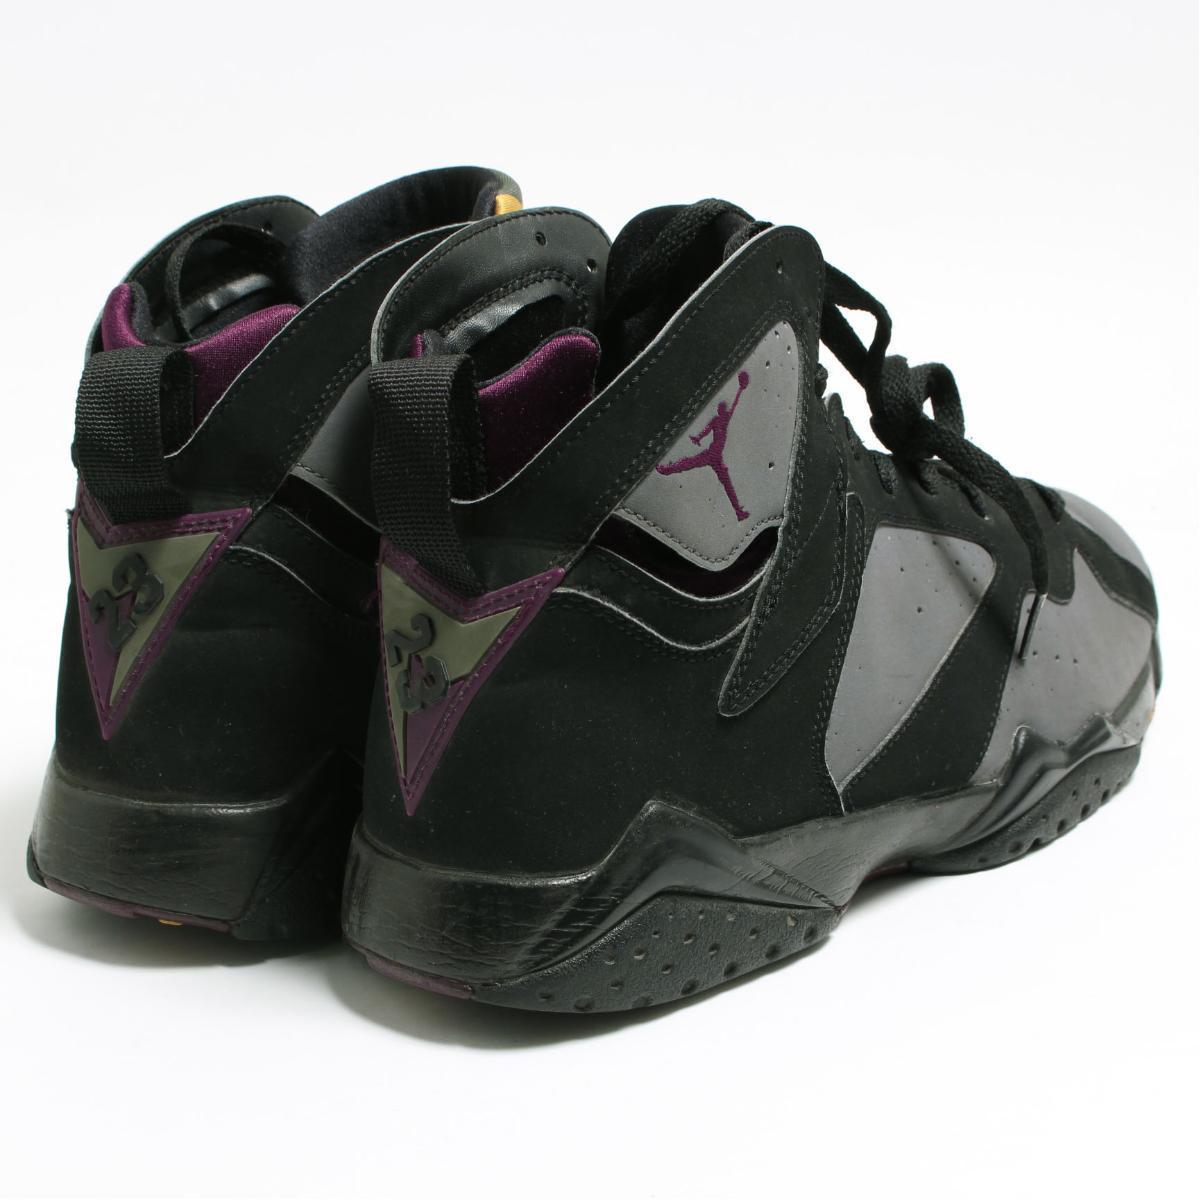 the latest 966b3 53179 ... sweden nike nike air jordan 7 retro sneakers us10 .5 mens 28.5cm  bon8477 60014